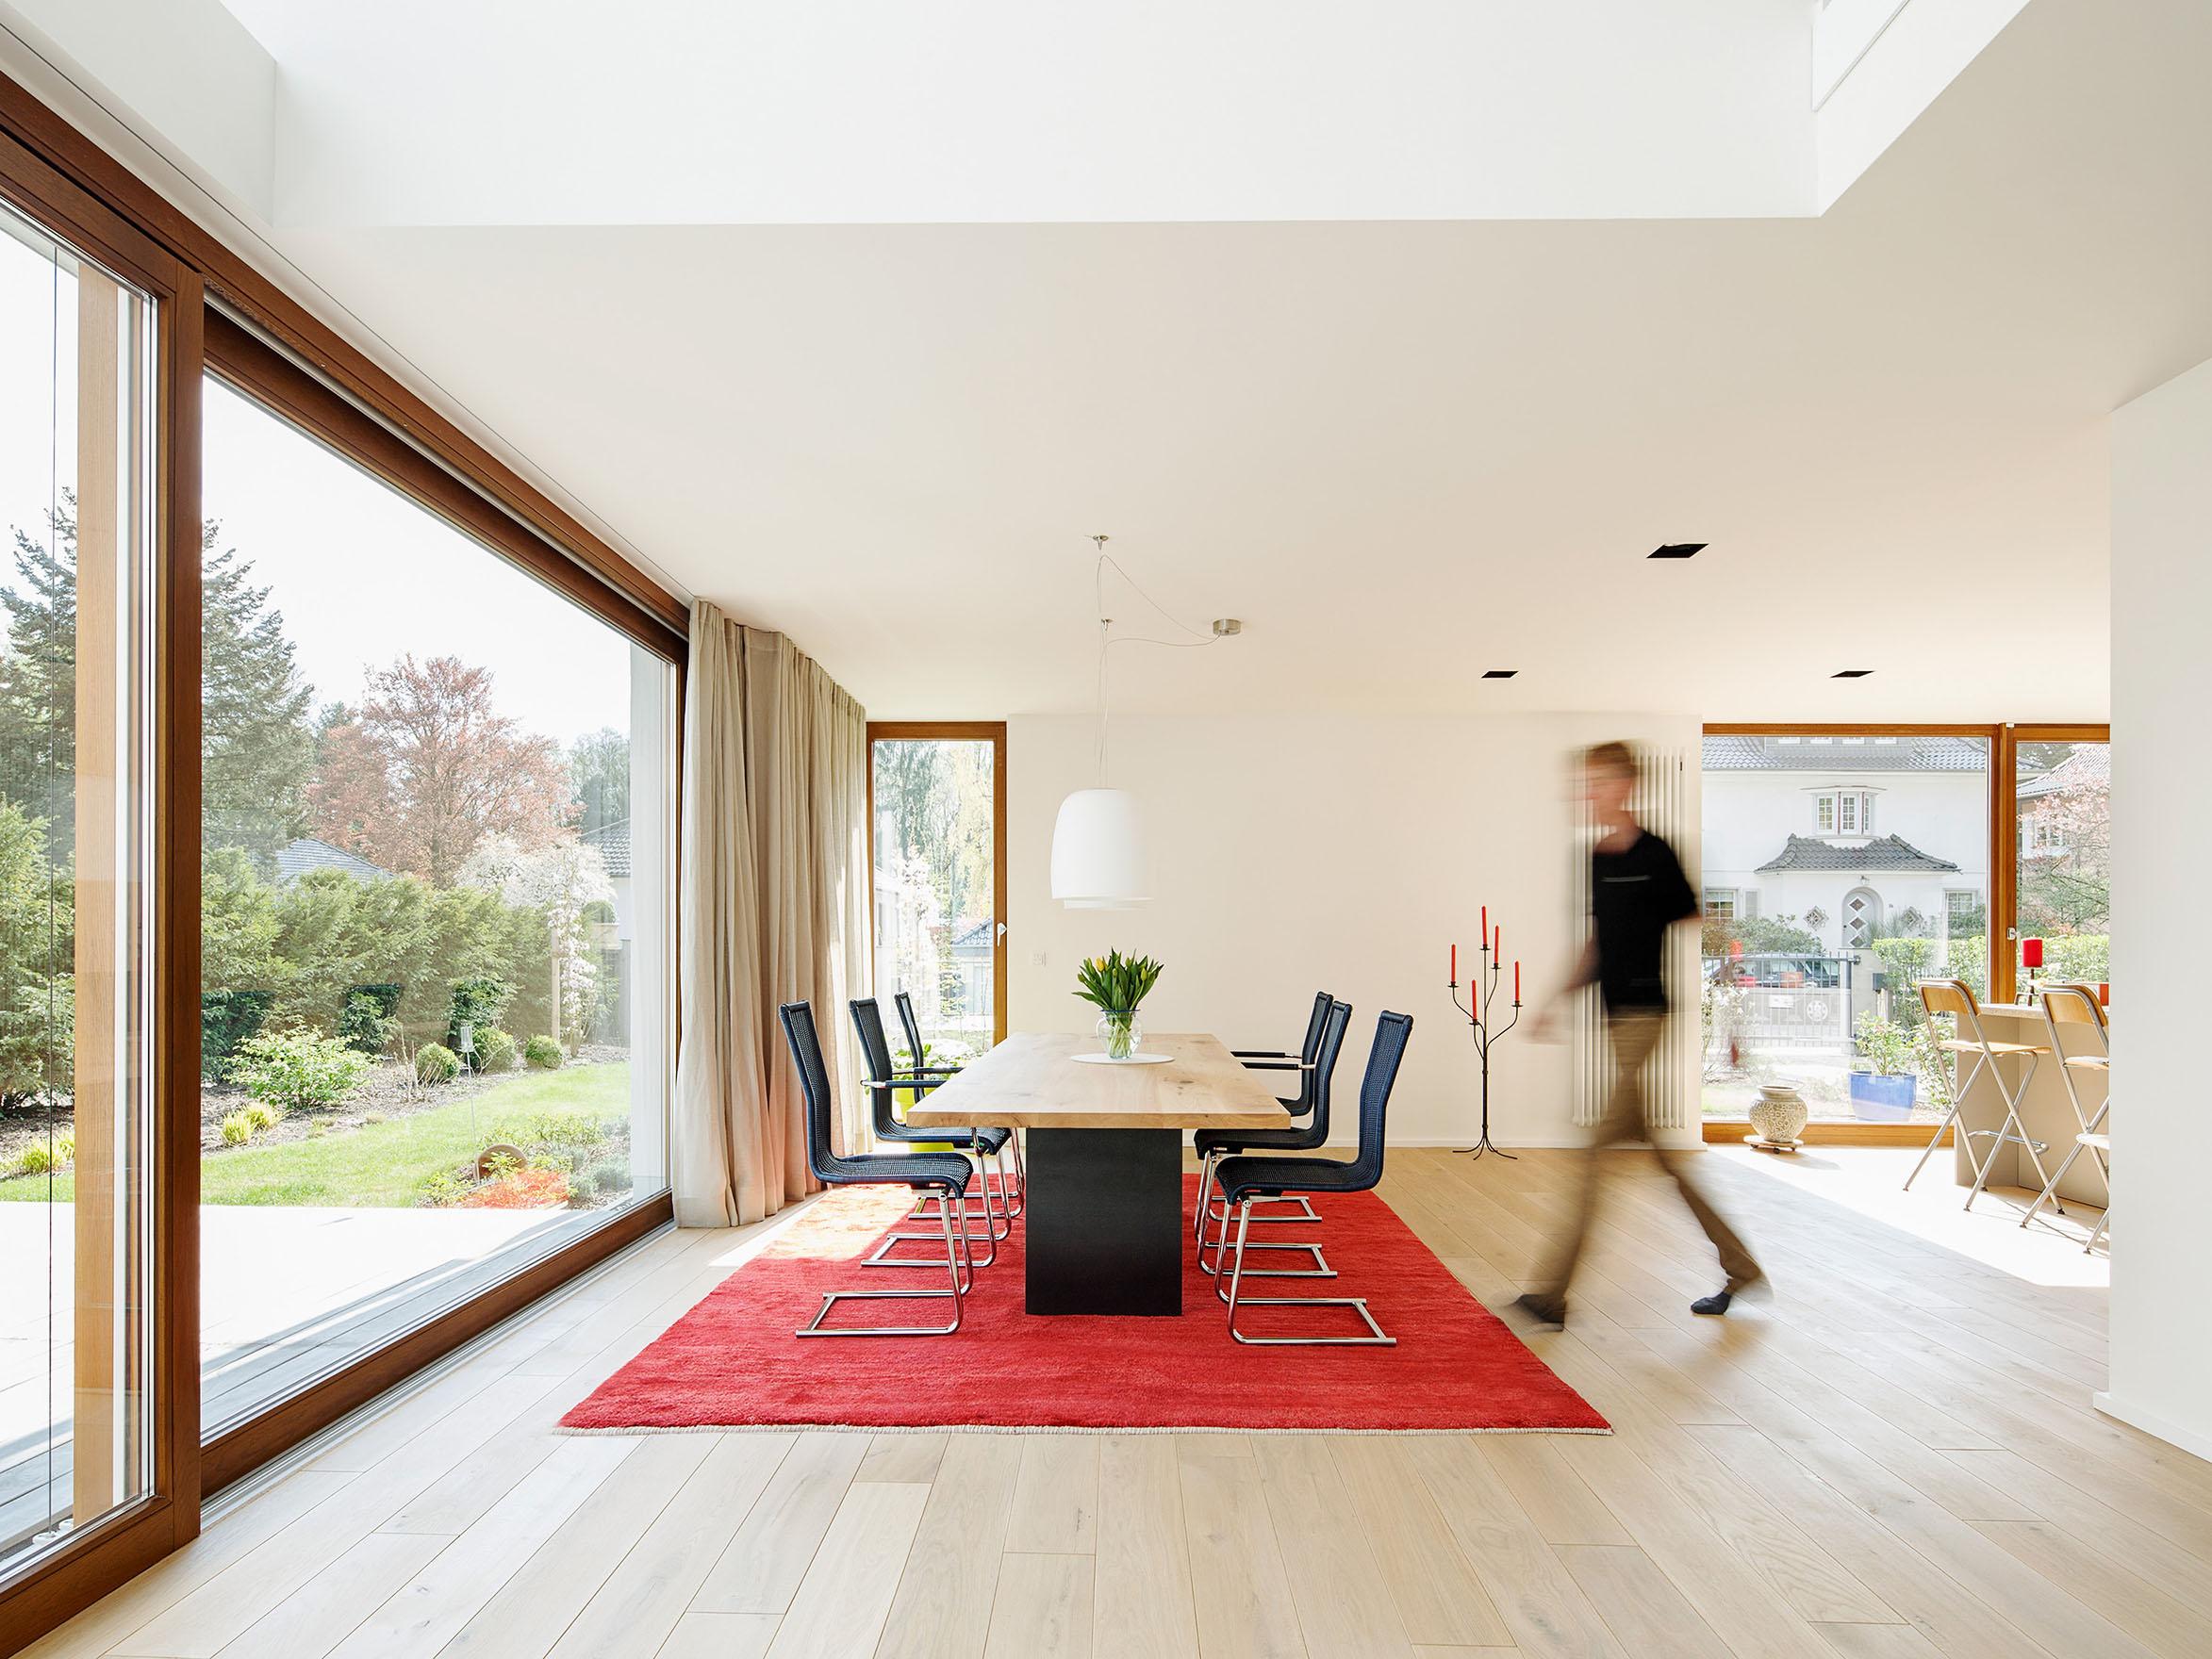 Privathaus Köln privathaus köln lll falke architekten 2015 fotografie frank